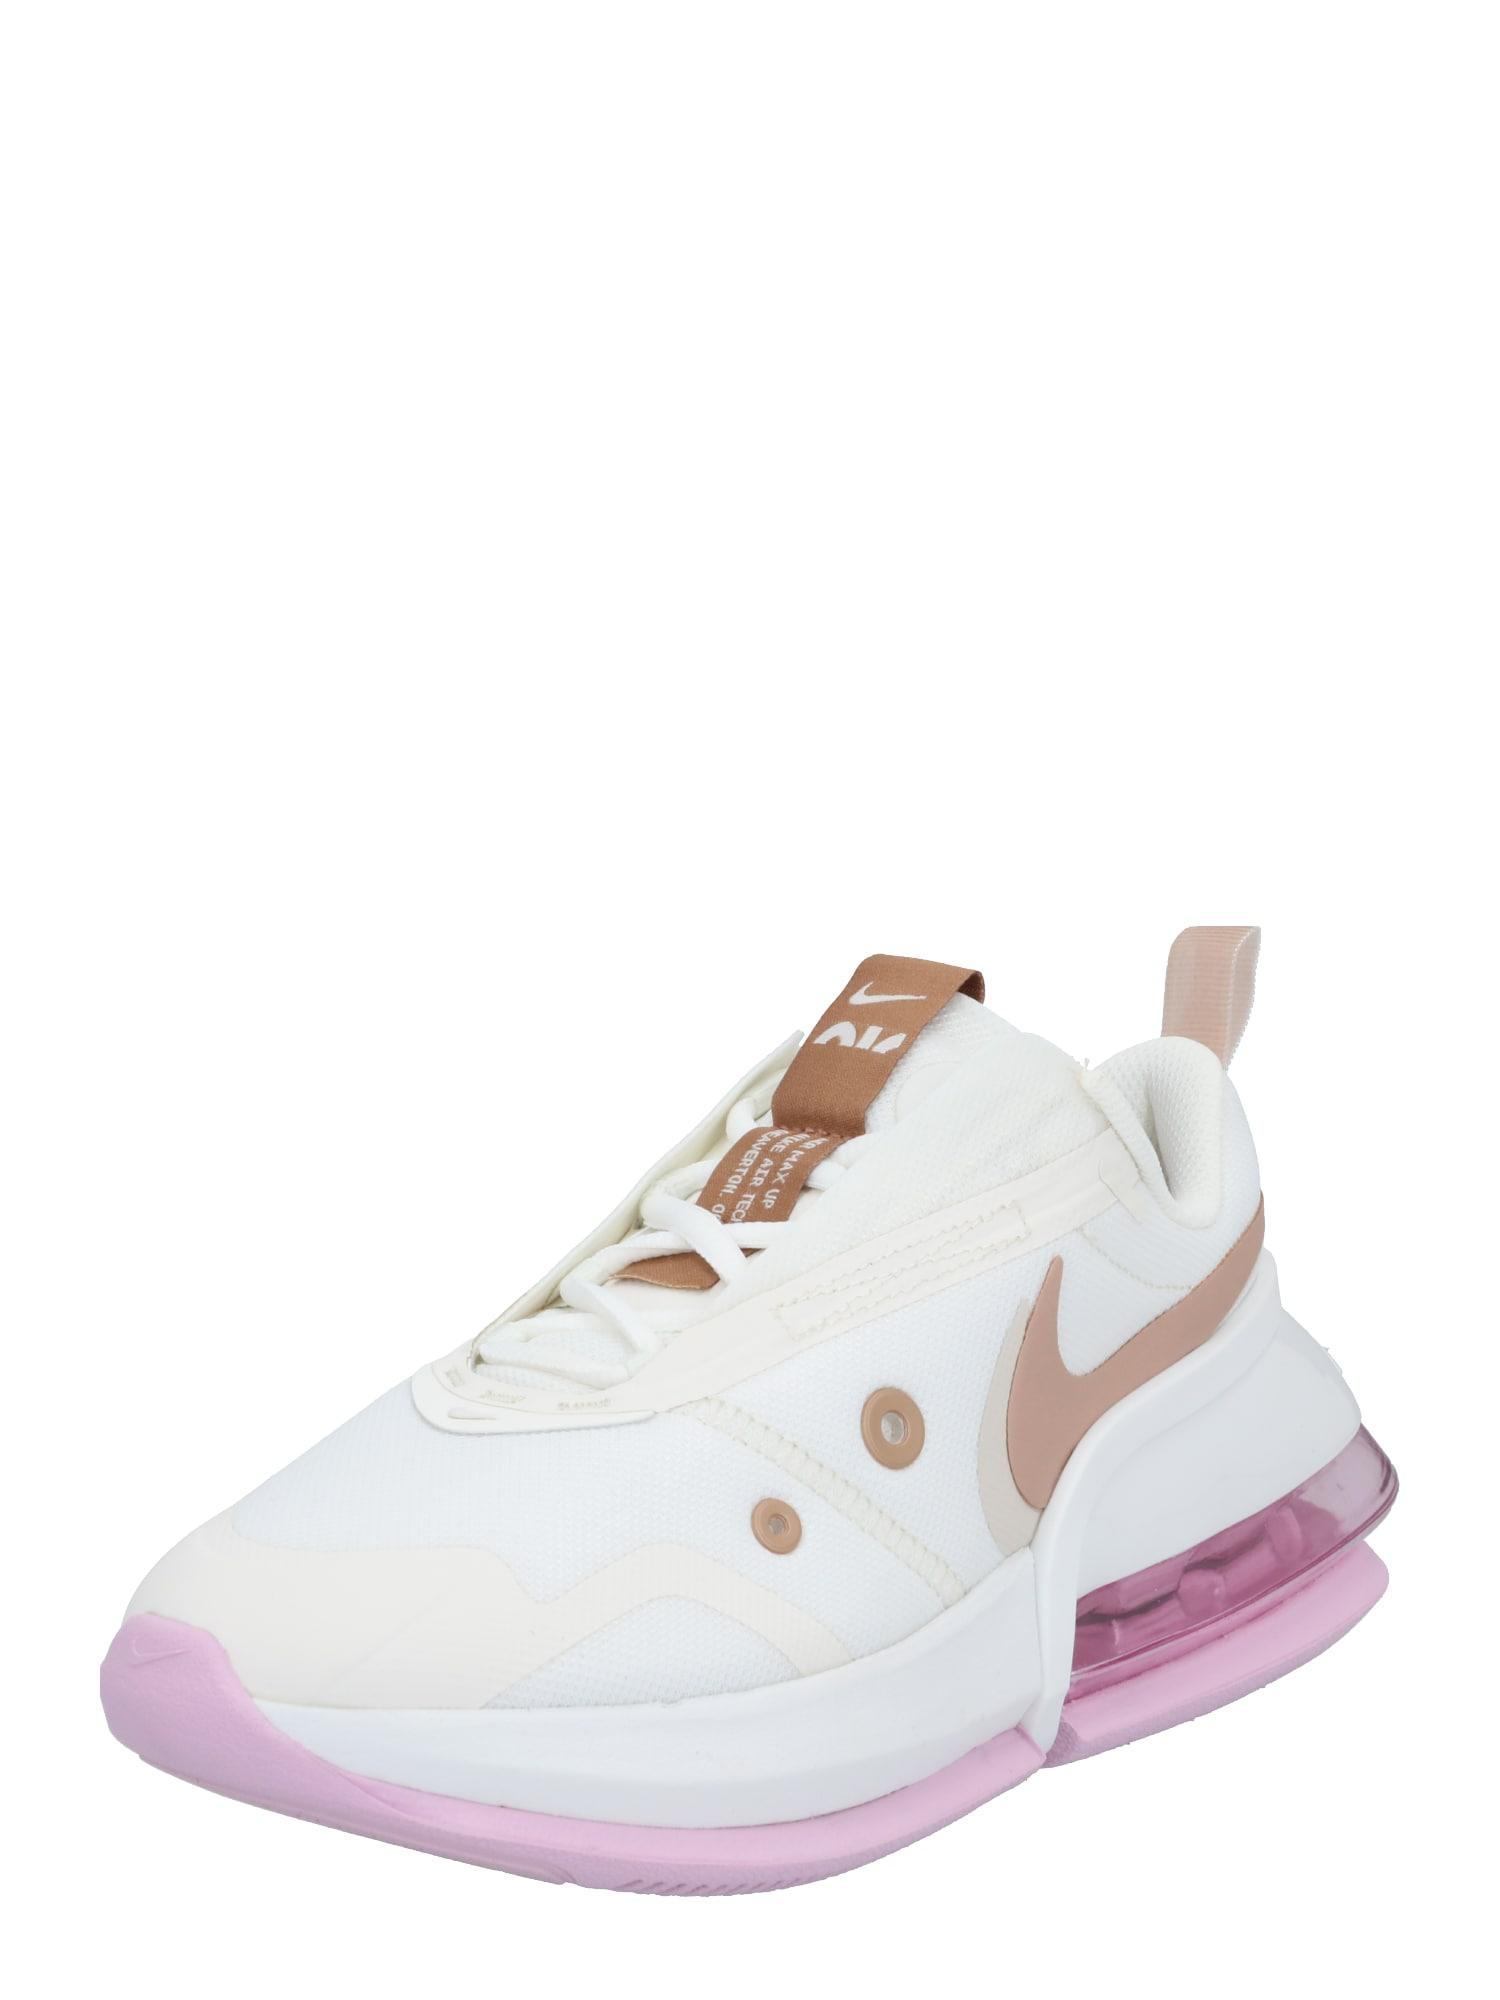 Nike Sportswear Tenisky 'Air Max Up'  bílá / hnědá / fialová